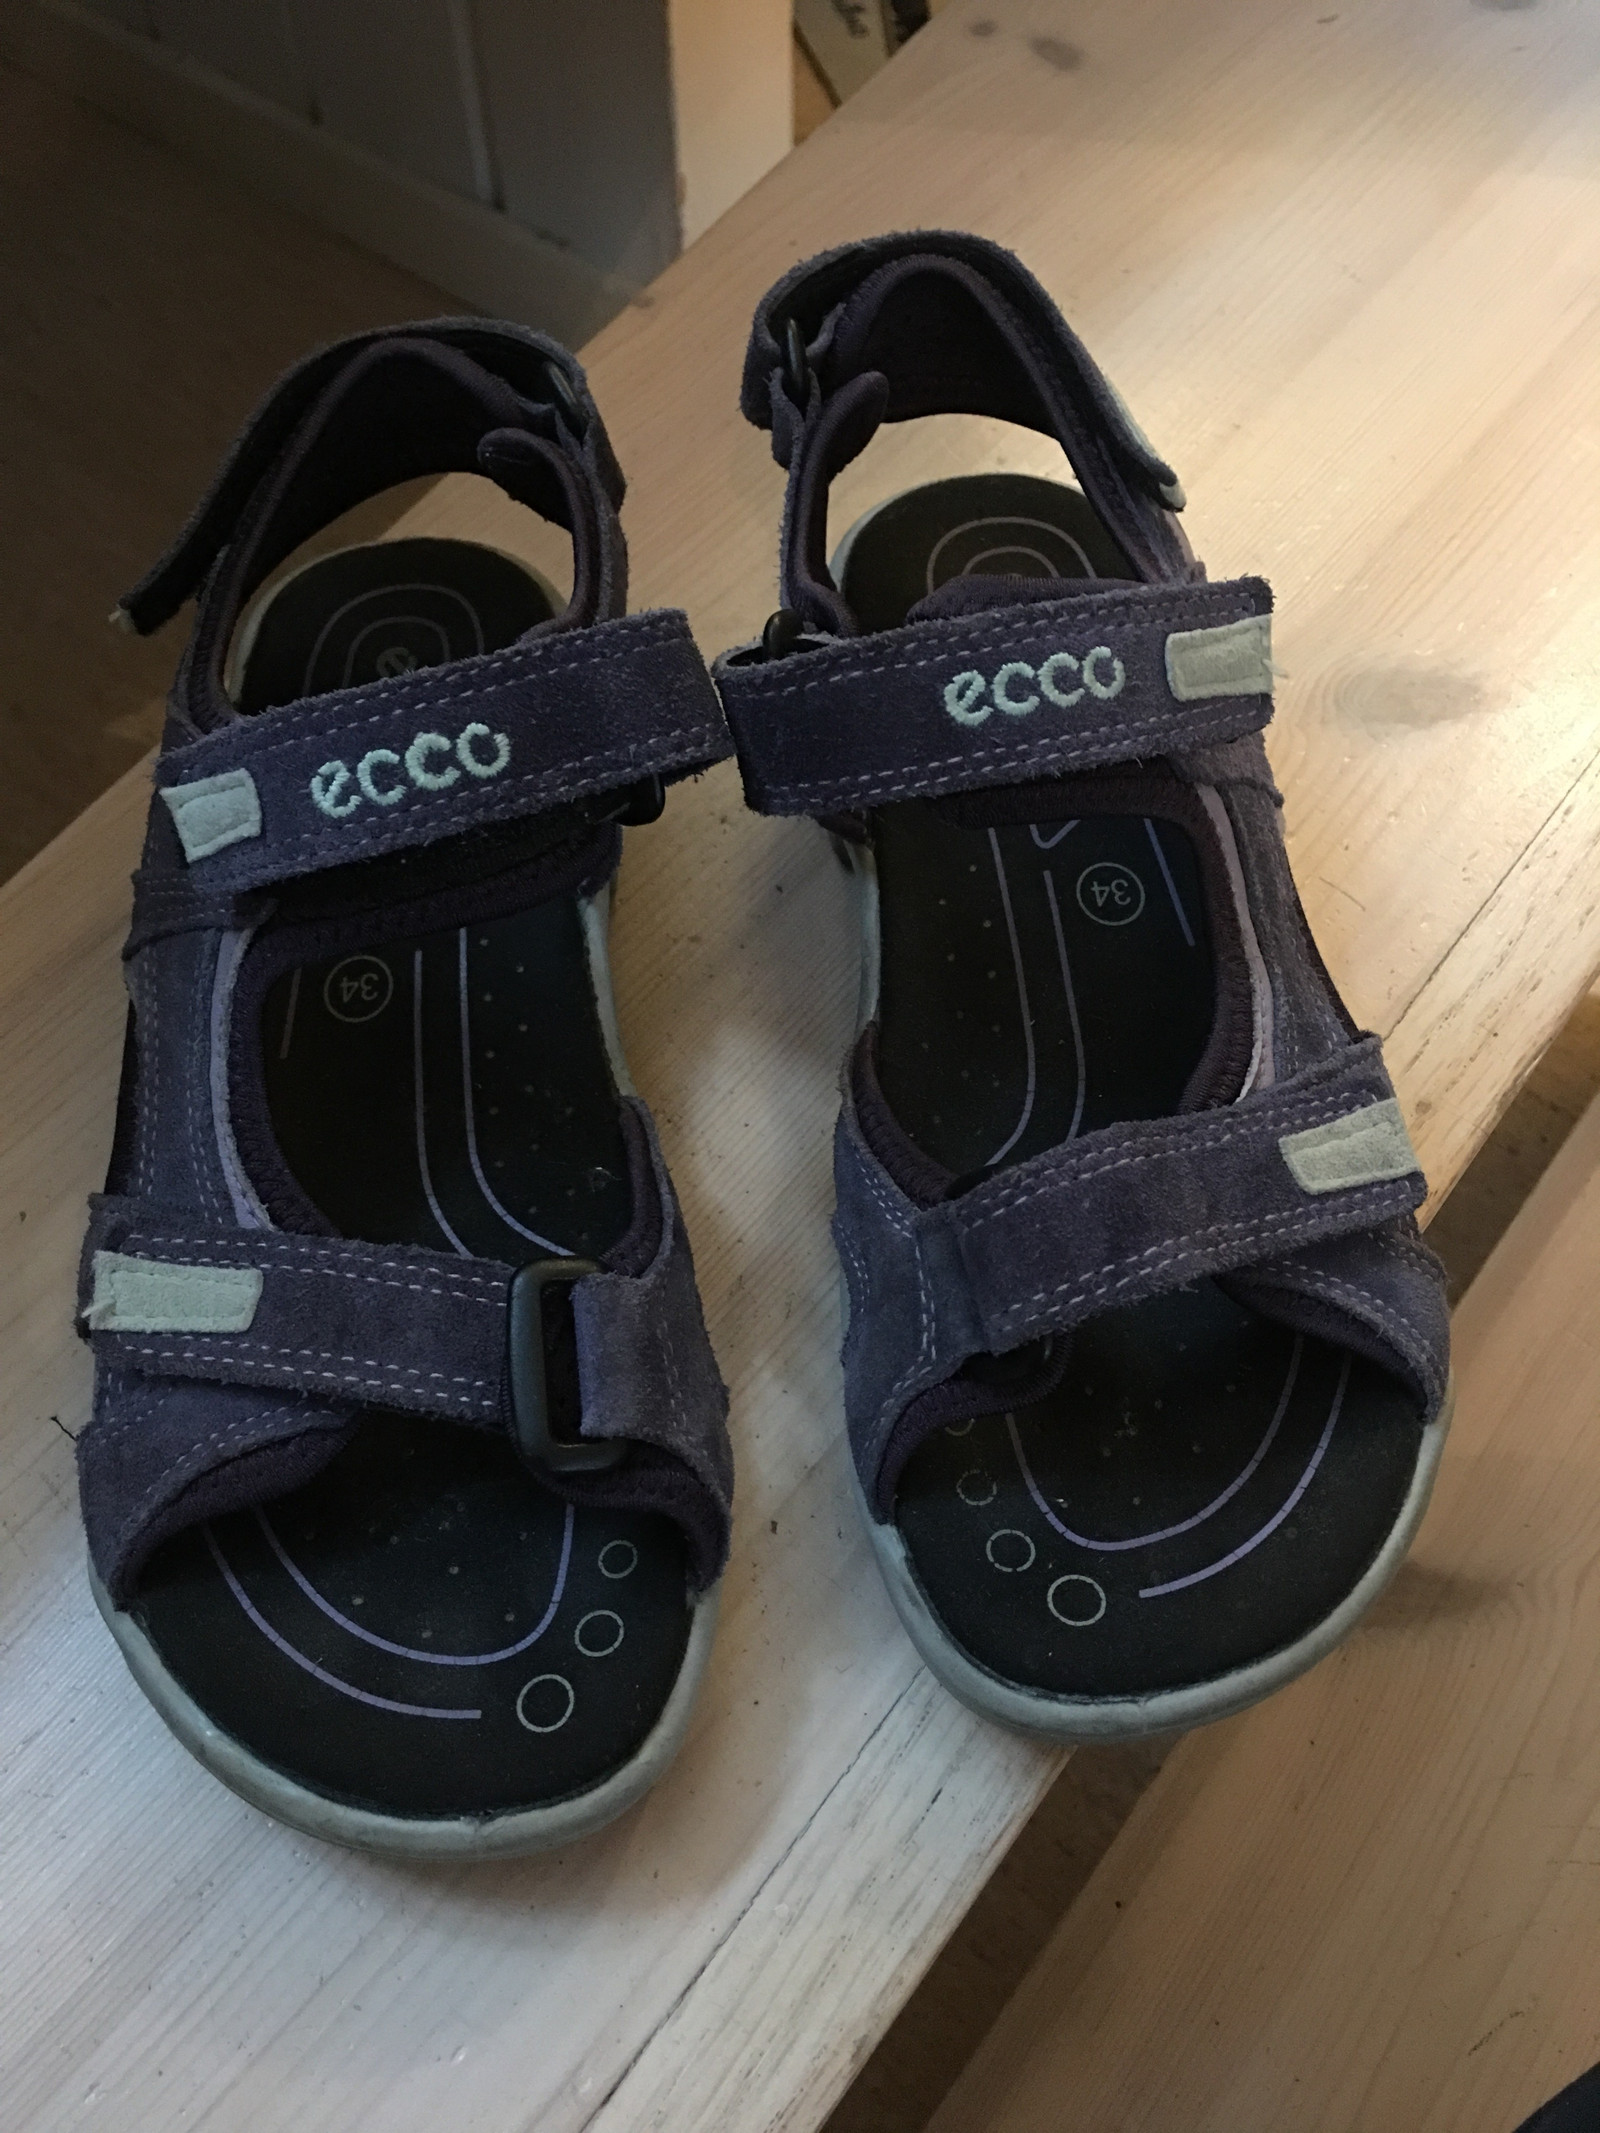 9703f3e0b58 Ecco sandaler i str 34   FINN.no